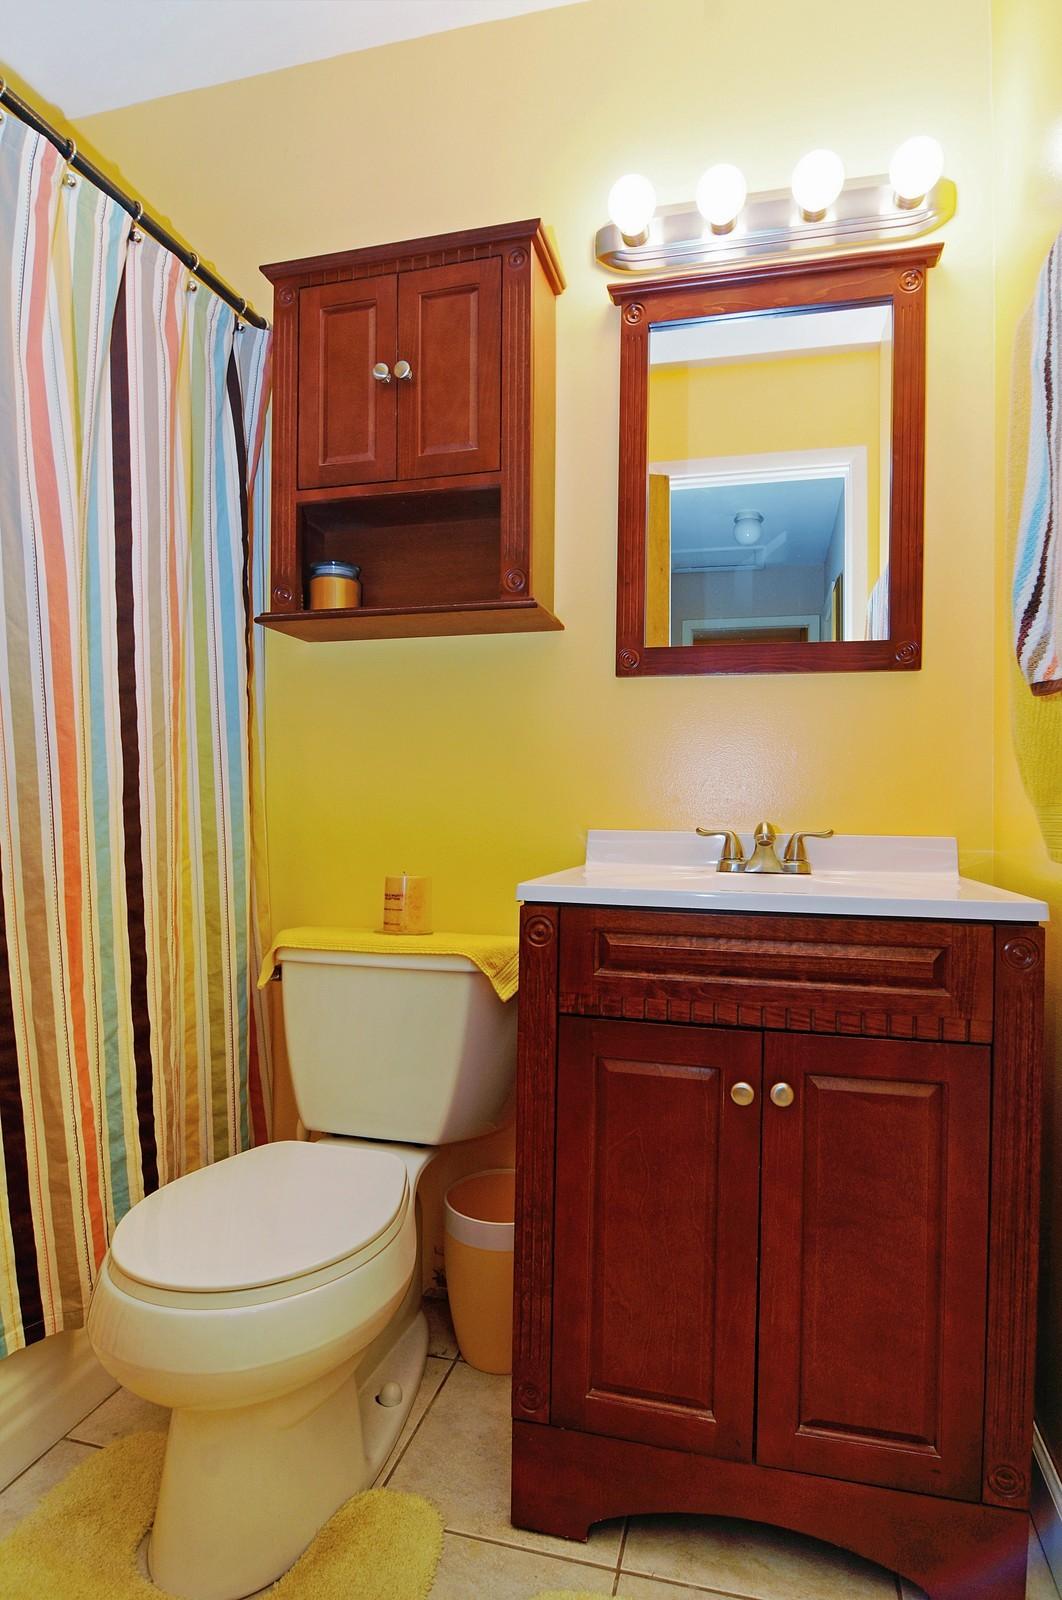 Real Estate Photography - 813 Sunnyside, Thorton, IL, 60430 - Bathroom